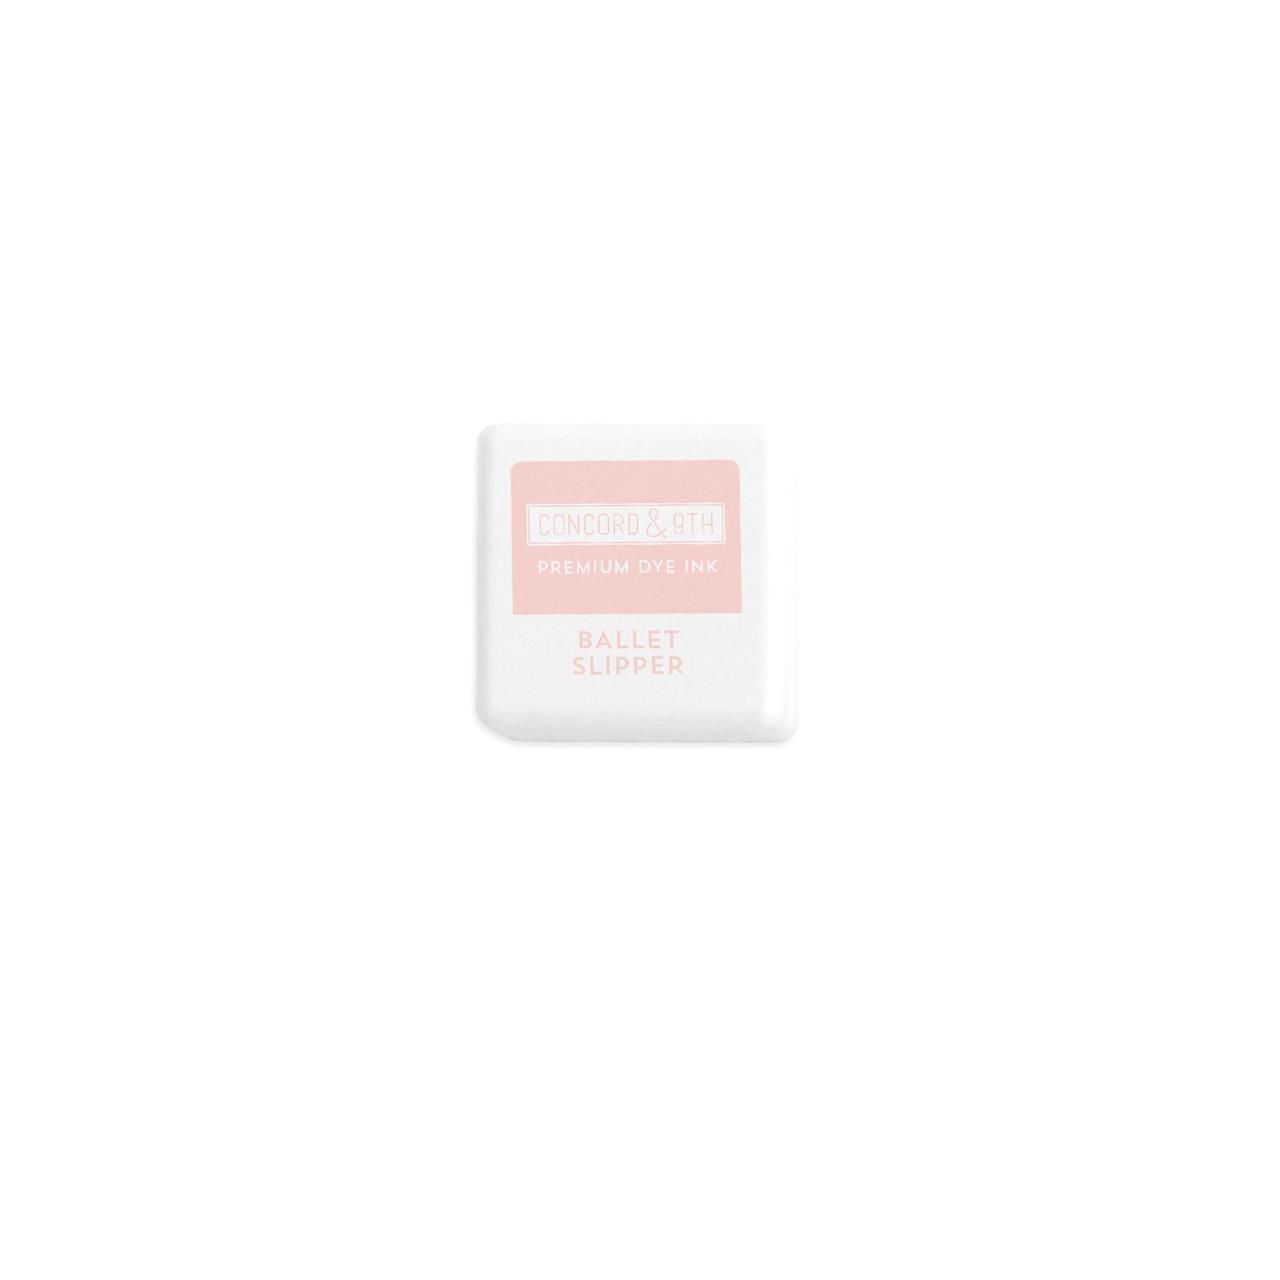 Ballet Slipper, Concord & 9th Premium Dye Ink Cubes - 090222402119